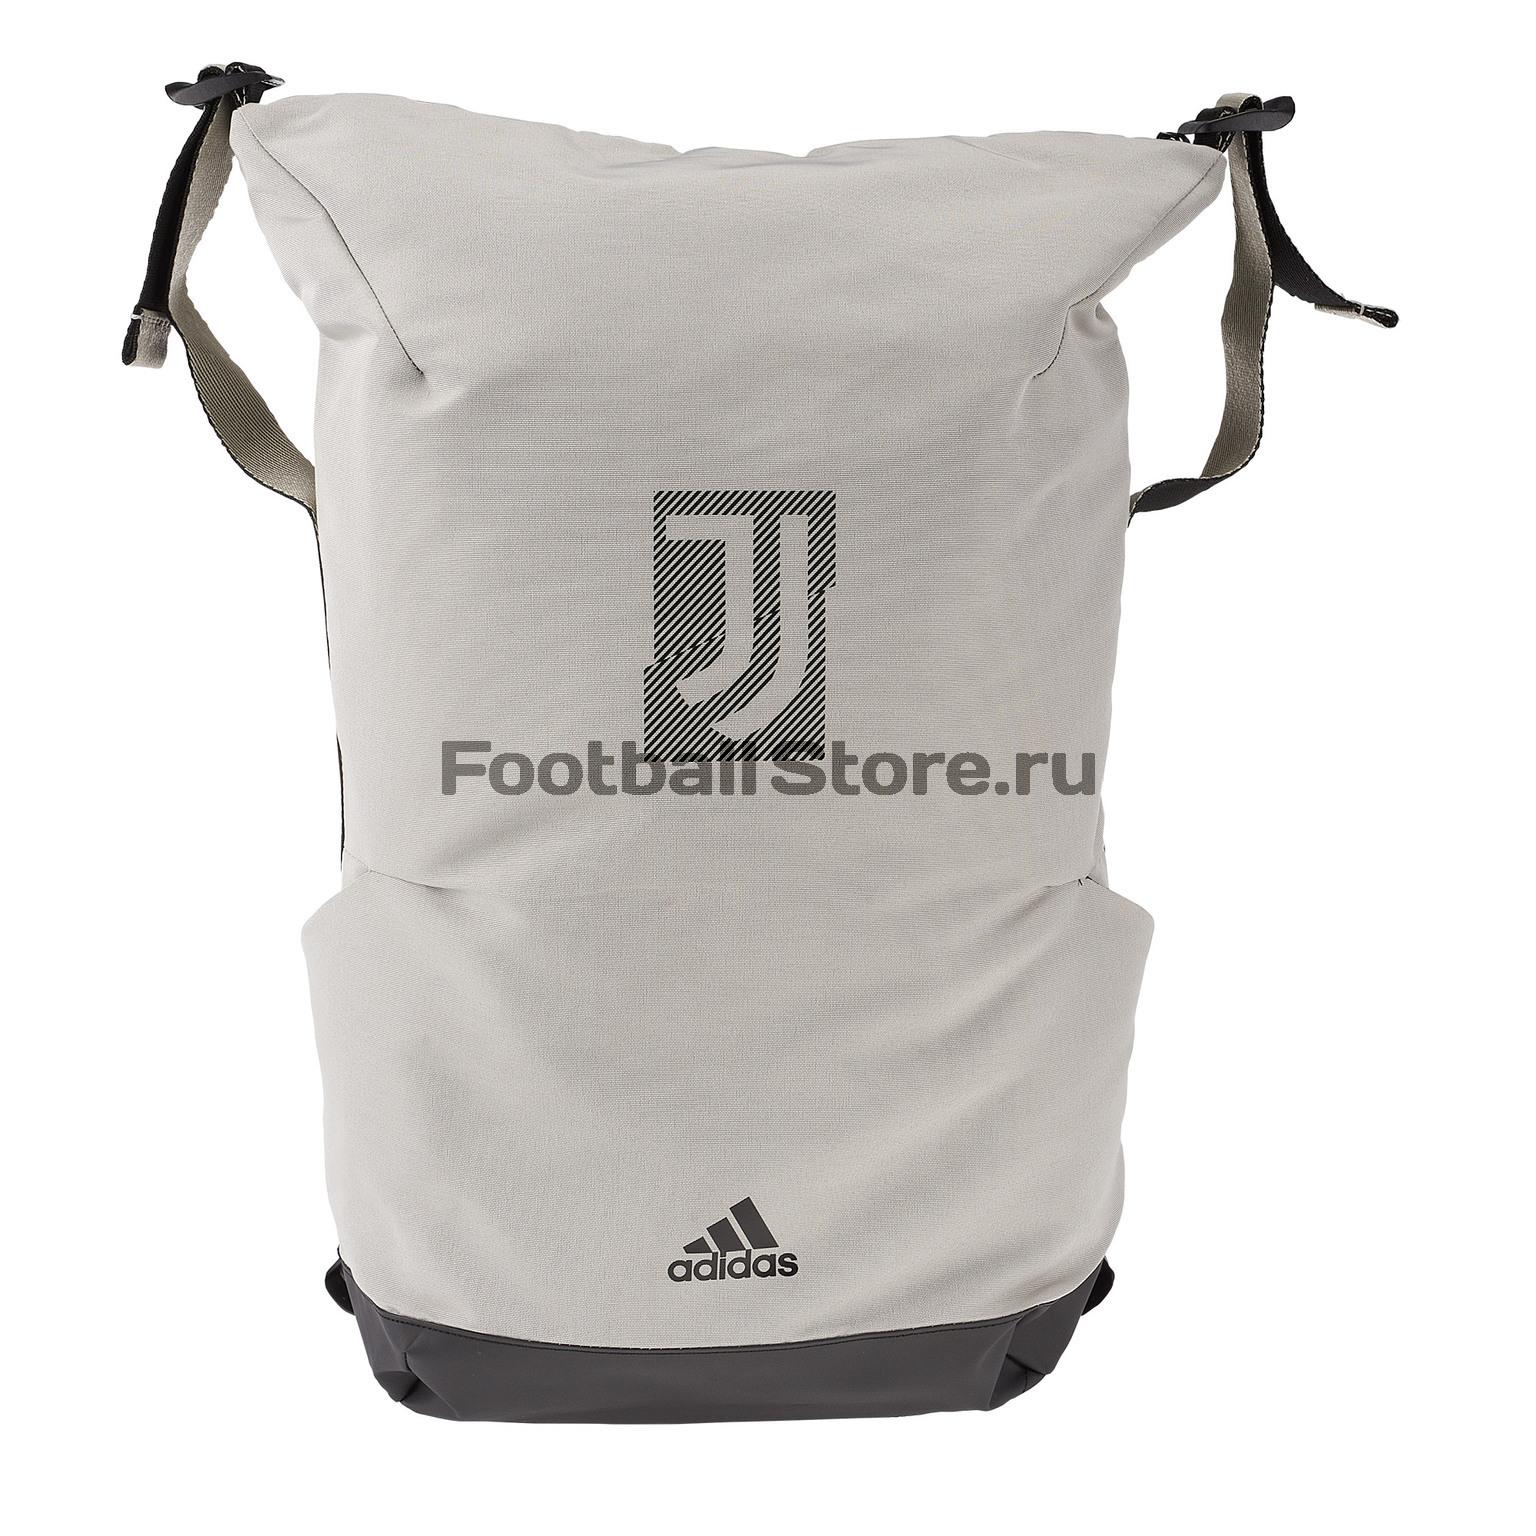 Рюкзак Adidas Juventus CY5571 рюкзак adidas 2014 m67763